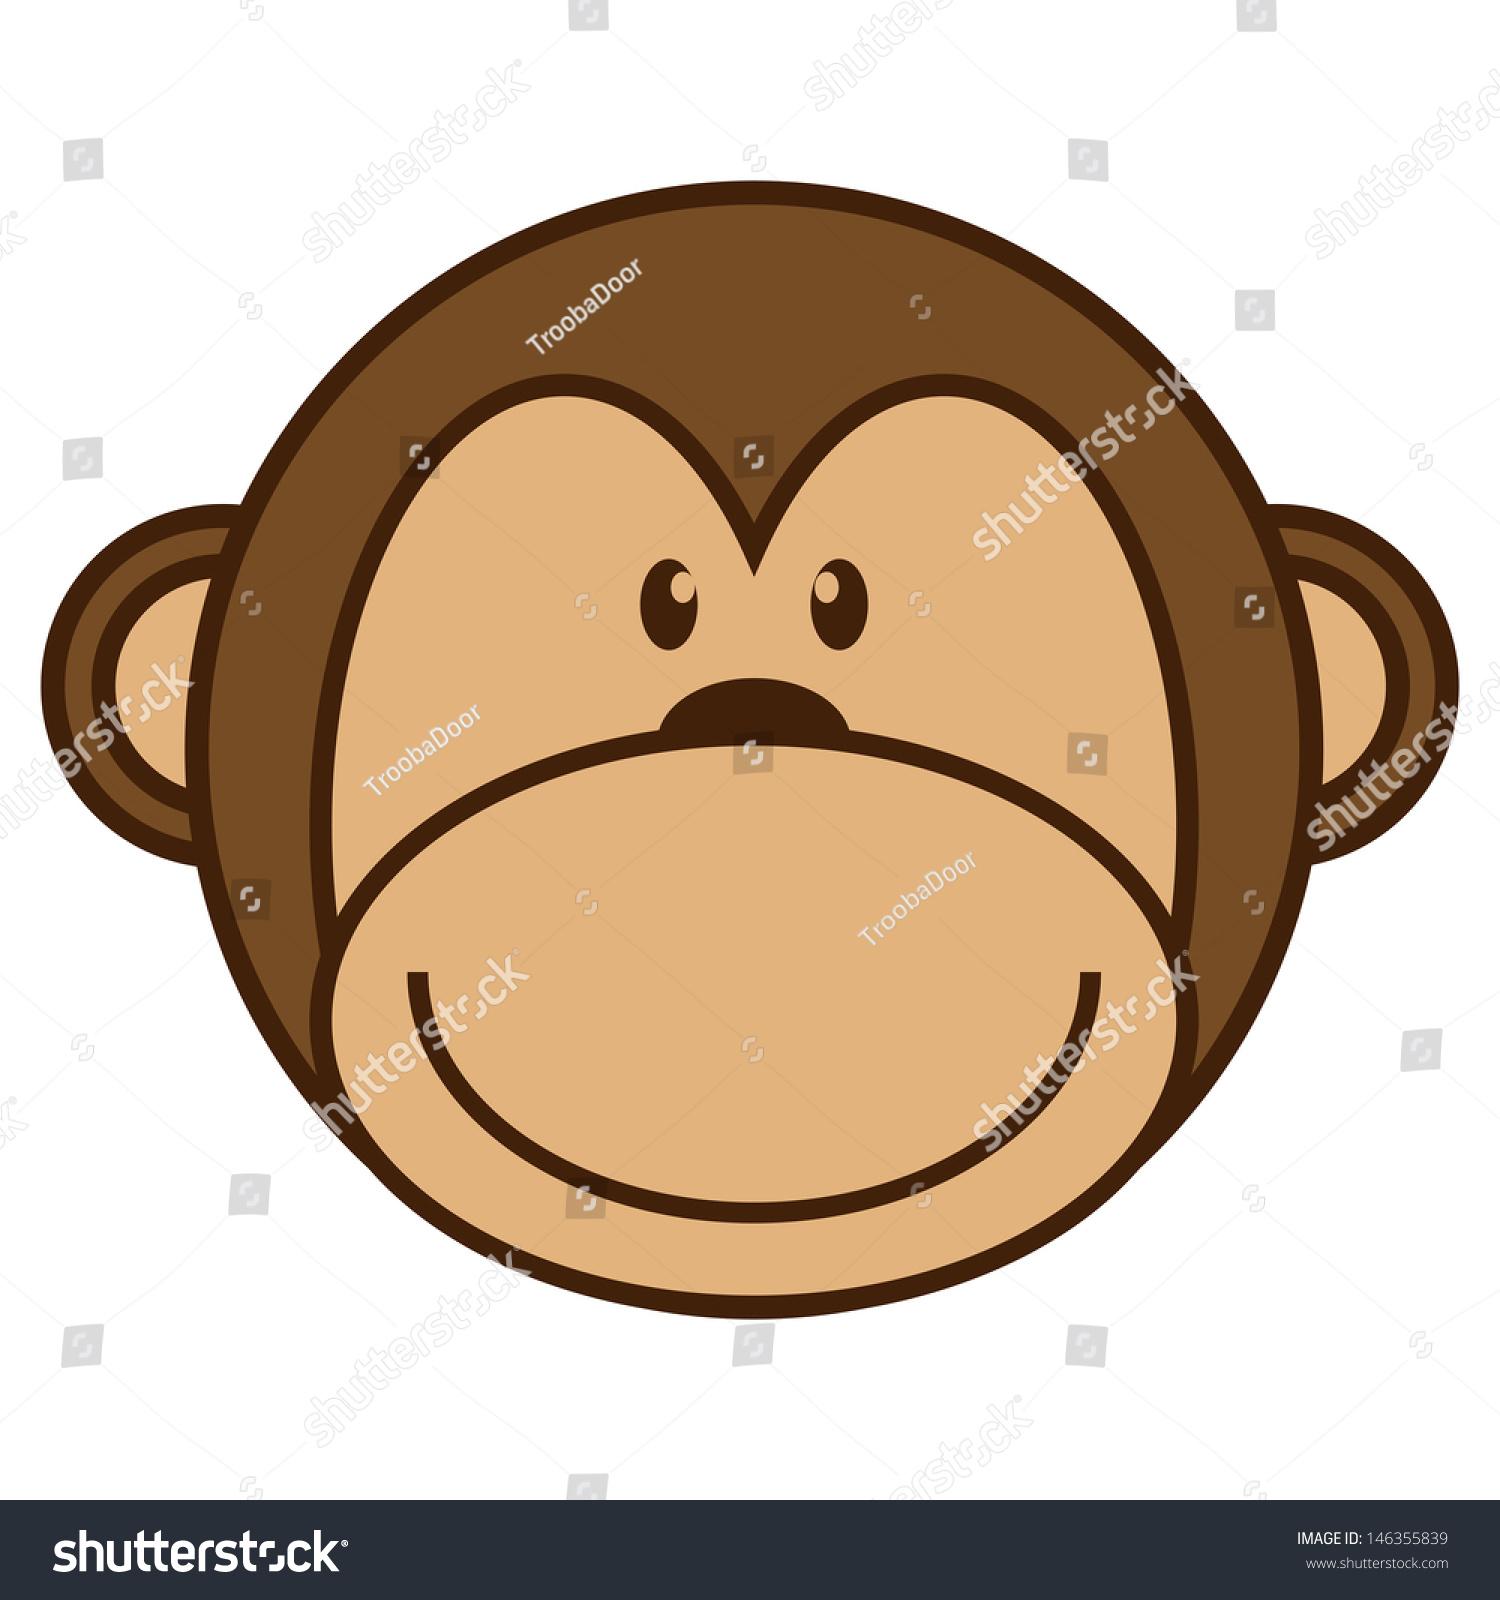 cartoon monkey stock photo photo vector illustration 146355839 rh shutterstock com cartoon monkey faces clip art cartoon monkey face rom game